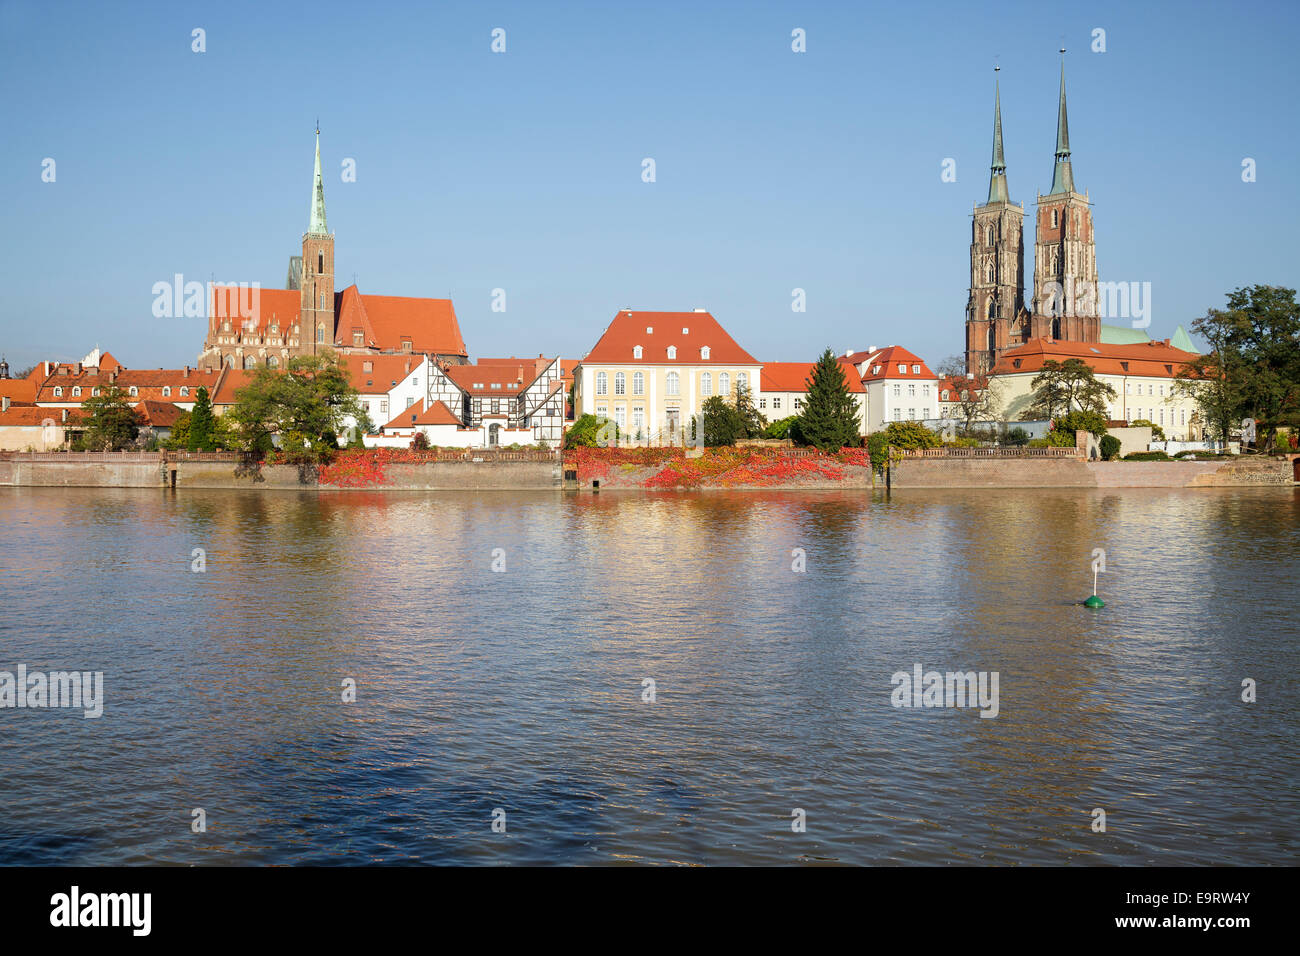 Cathedral Island Ostrow Tumski, Wroclaw, Poland Stock Photo